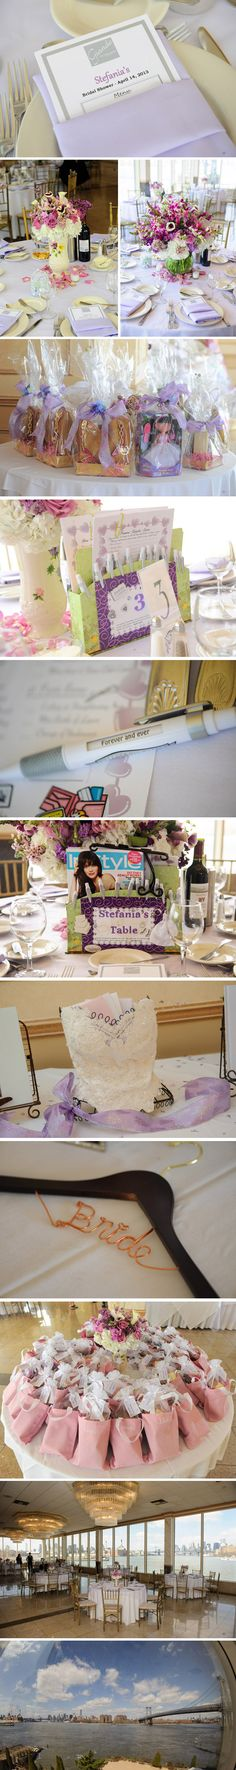 Surprise Bridal Shower - Fun Bridal Shower Ideas | Wedding Planning, Ideas & Etiquette | Bridal Guide Magazine